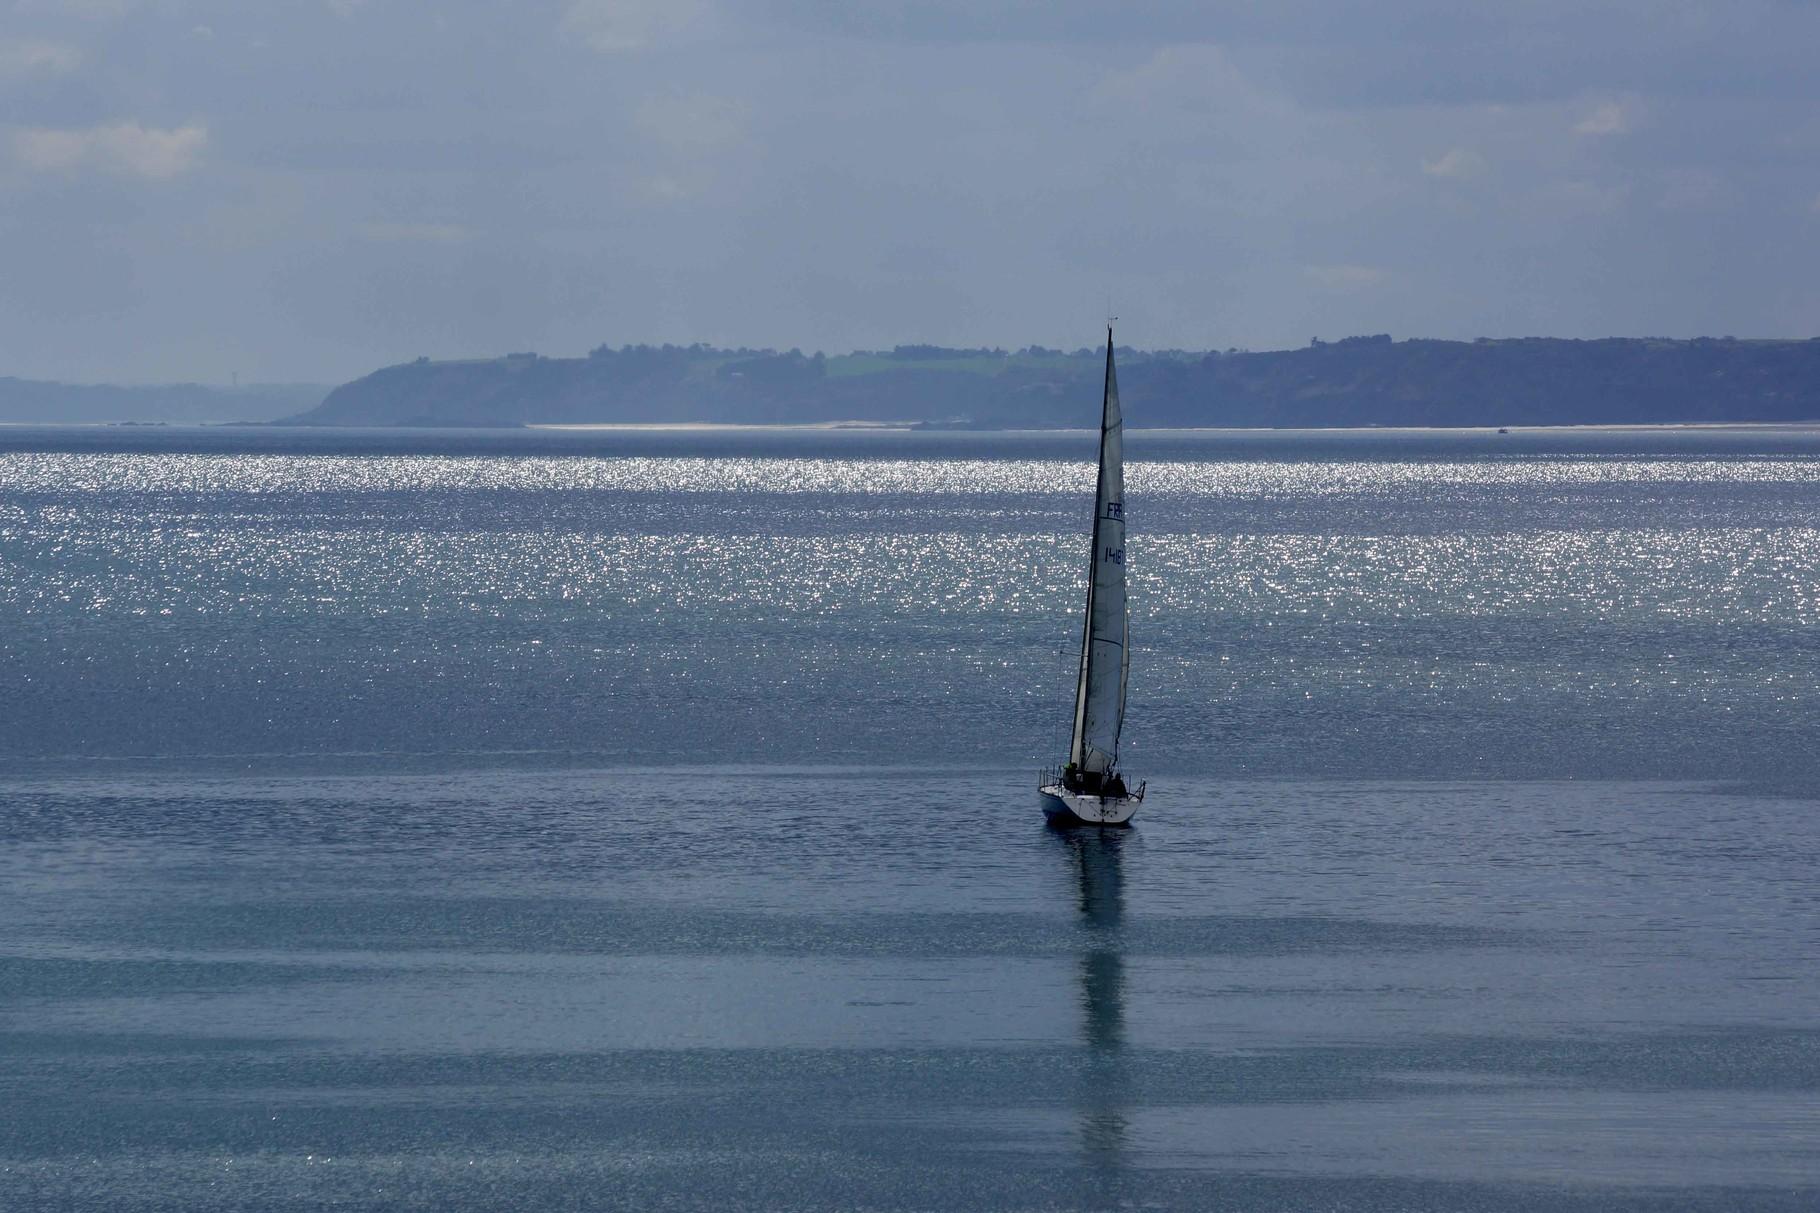 St Quay voile 2